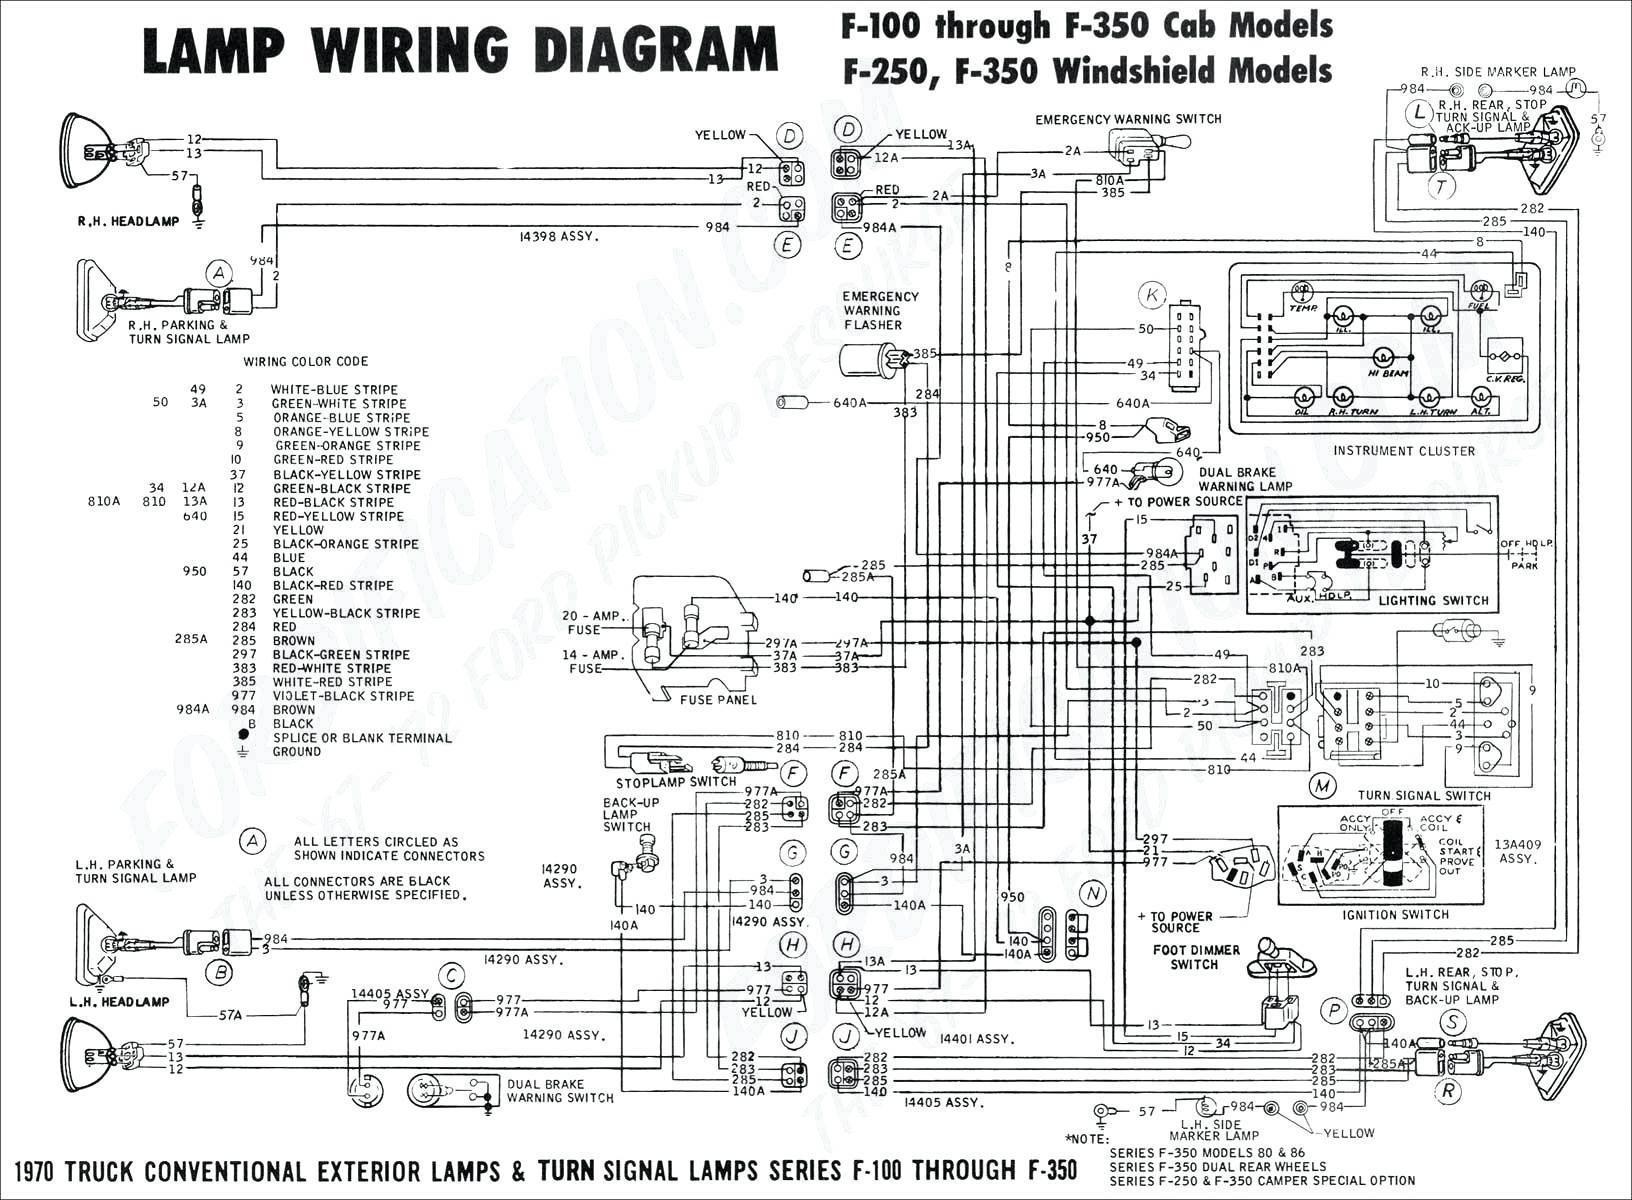 Dodge Spirit Diagram | Wiring Diagram - 99 Dodge Ram Headlight Wiring Diagram